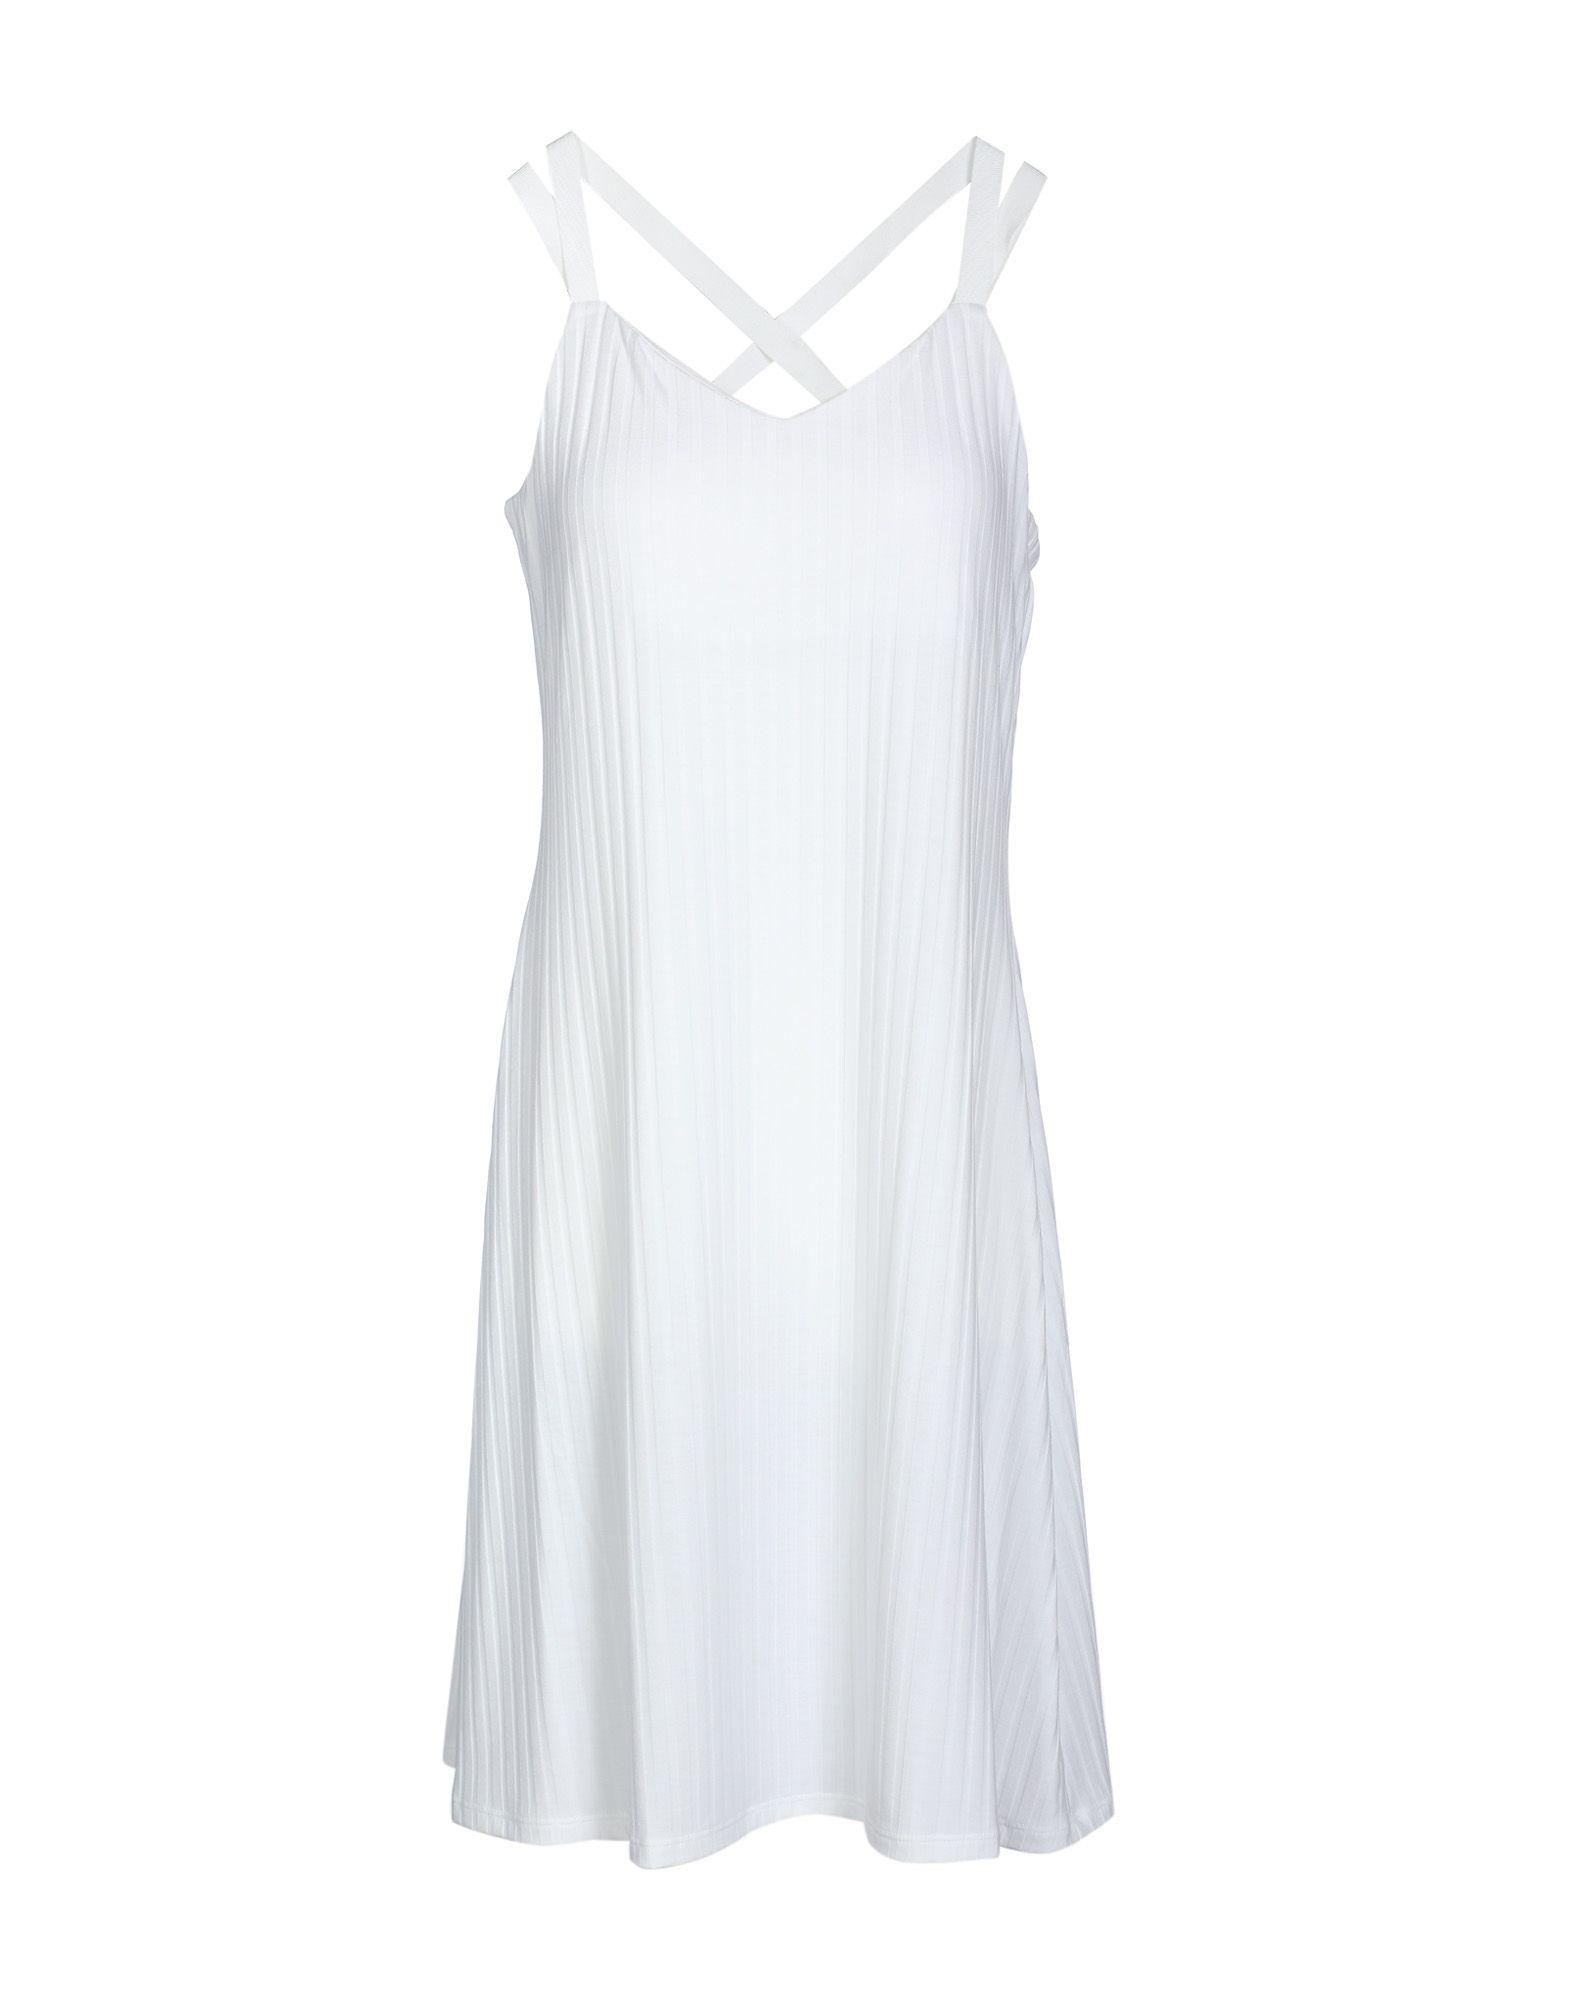 Armani Exchange Short Dress In White